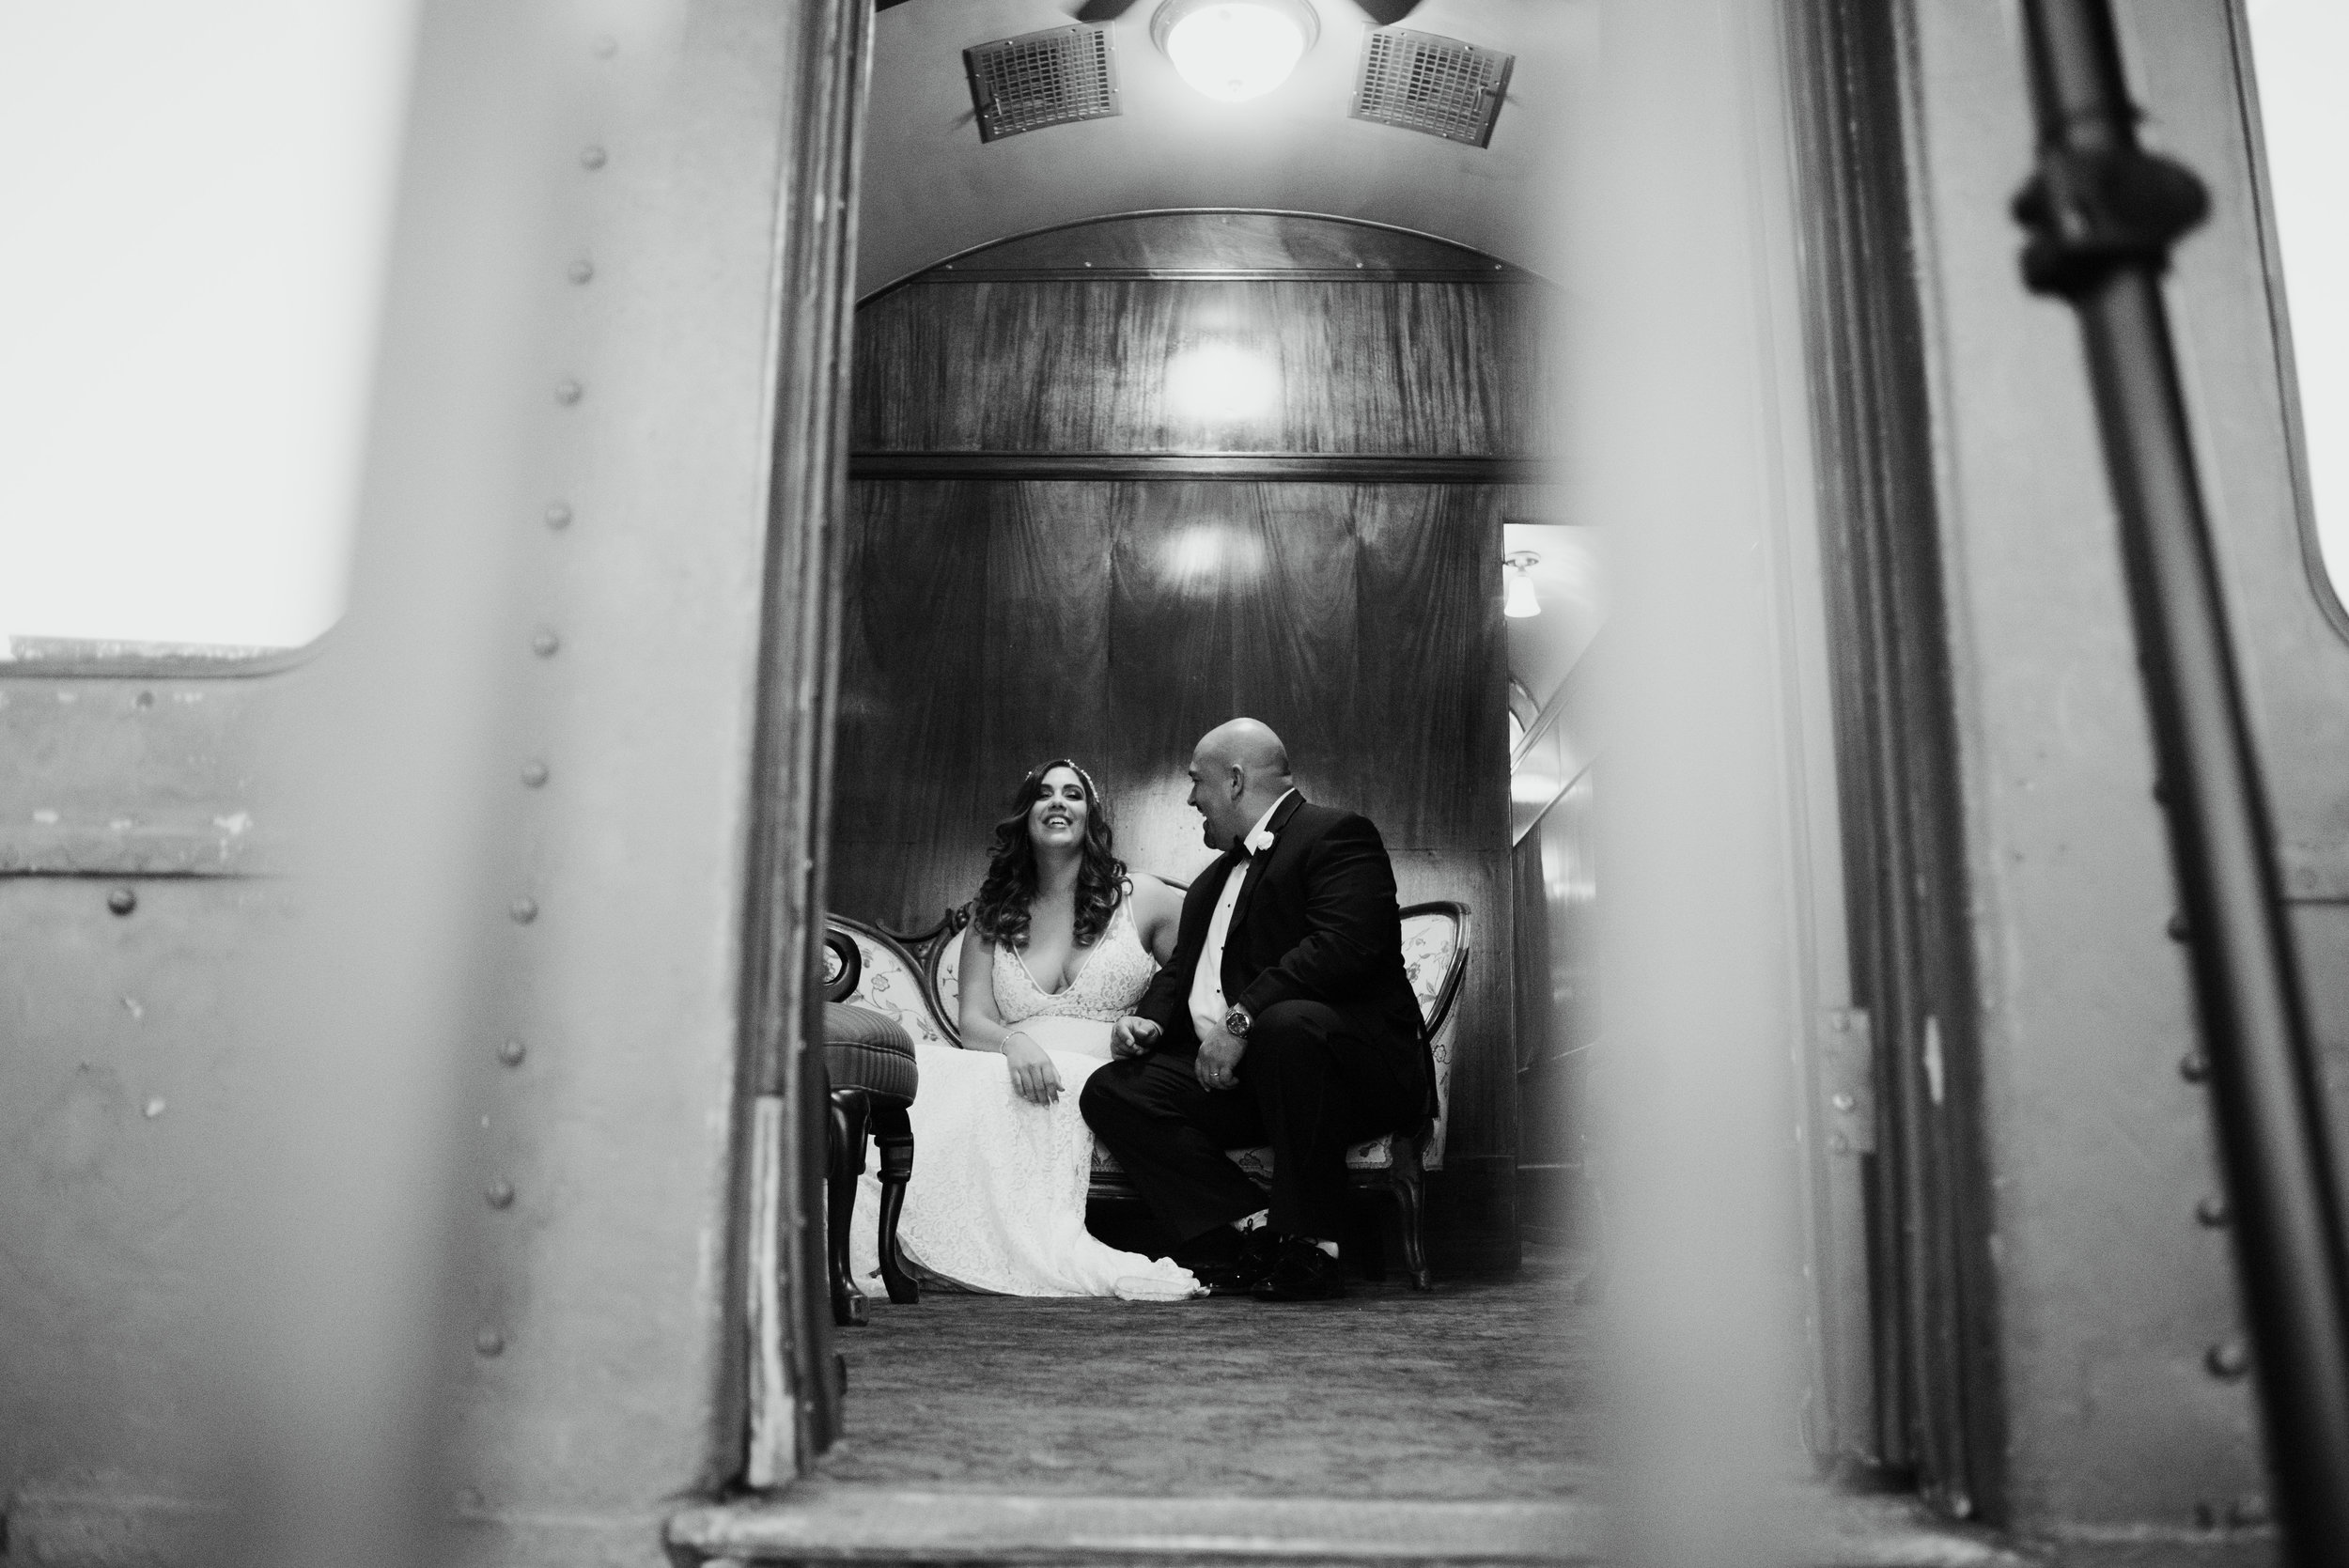 Iggy-and-yesenia-savannah-railroad-museum-wedding-meg-hill-photo- (765 of 1037).jpg